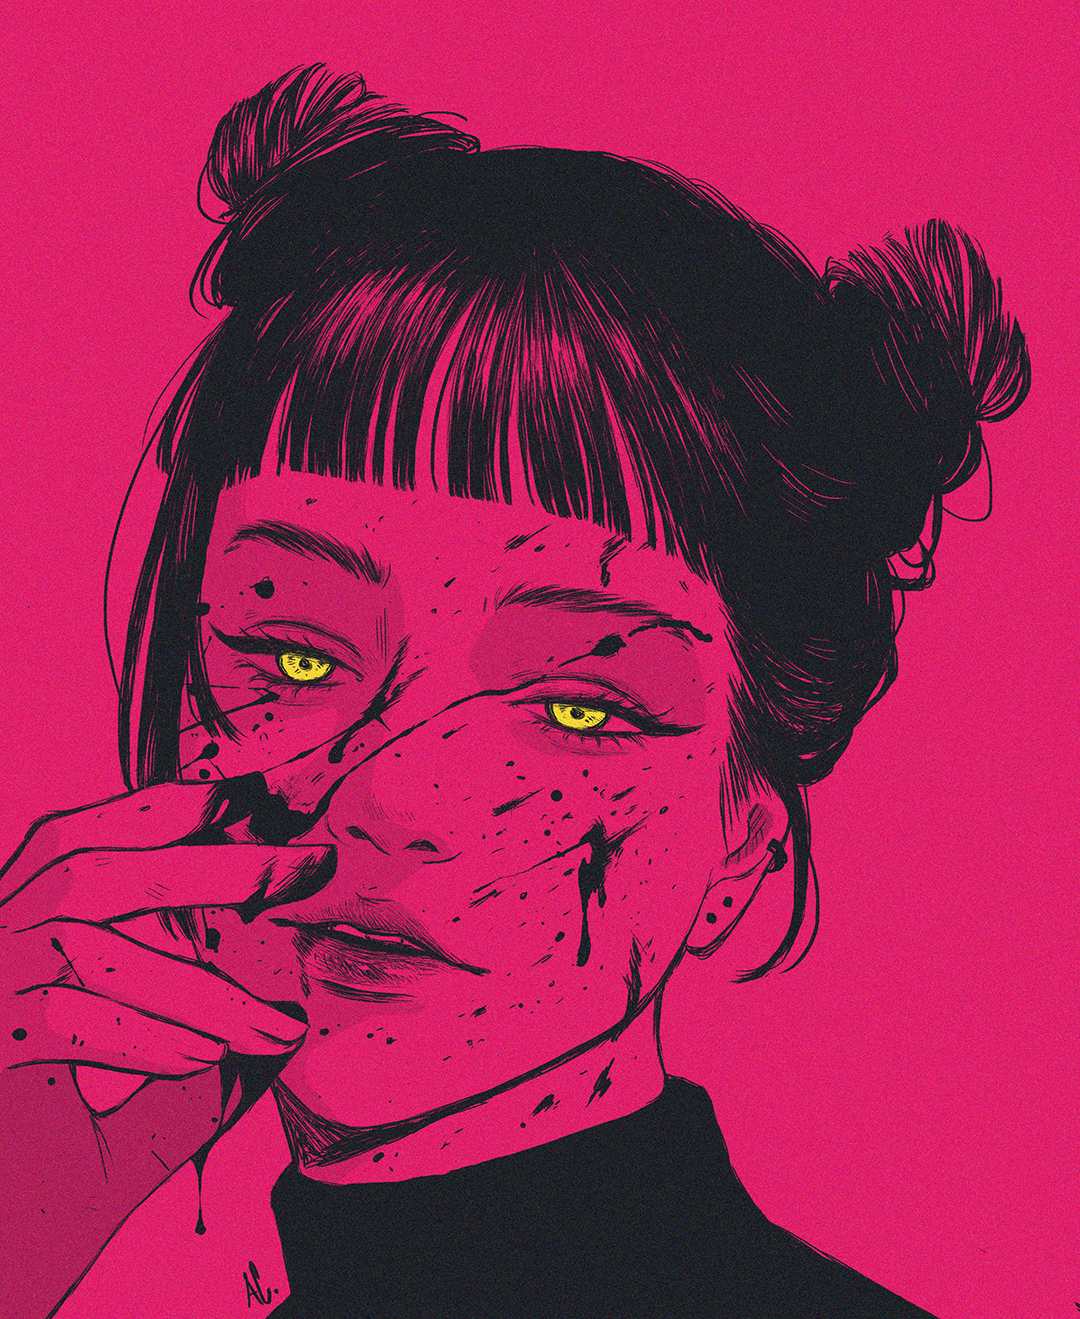 GirlsclubAsia-Illustrator-Anwita Citriya-8